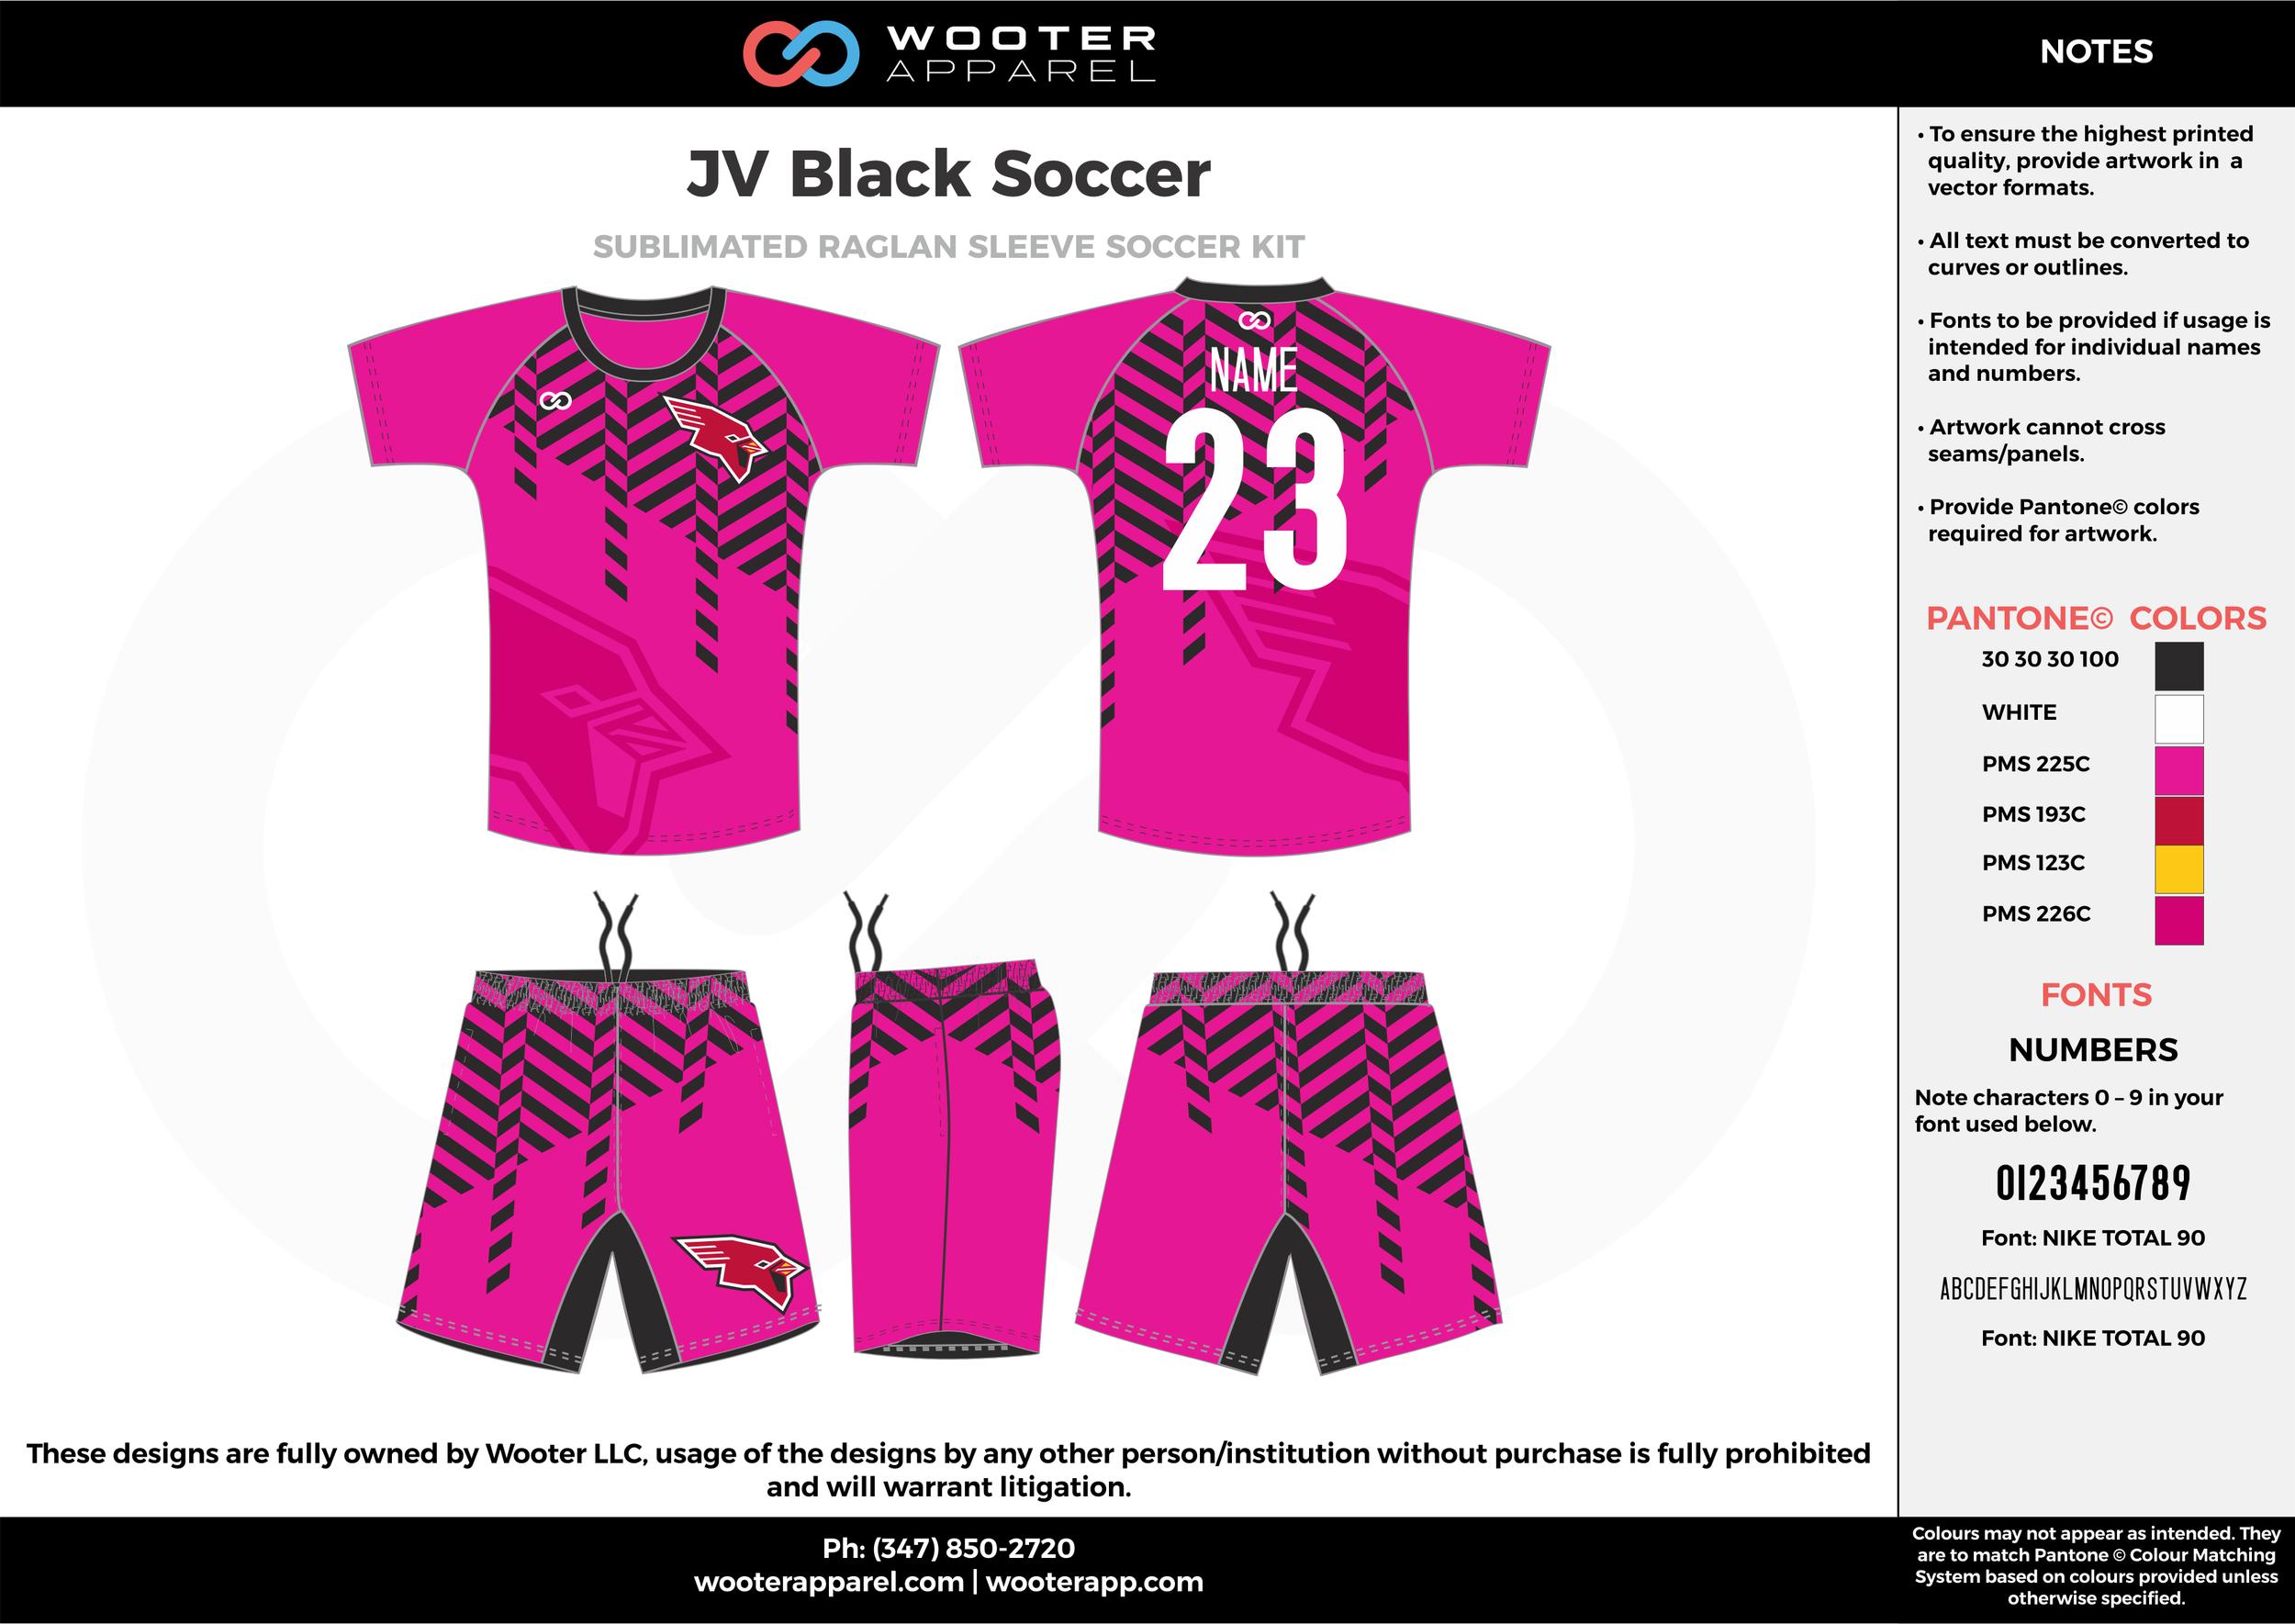 JV Black Soccer fuchsia pink black white custom sublimated soccer uniform jersey shirt shorts